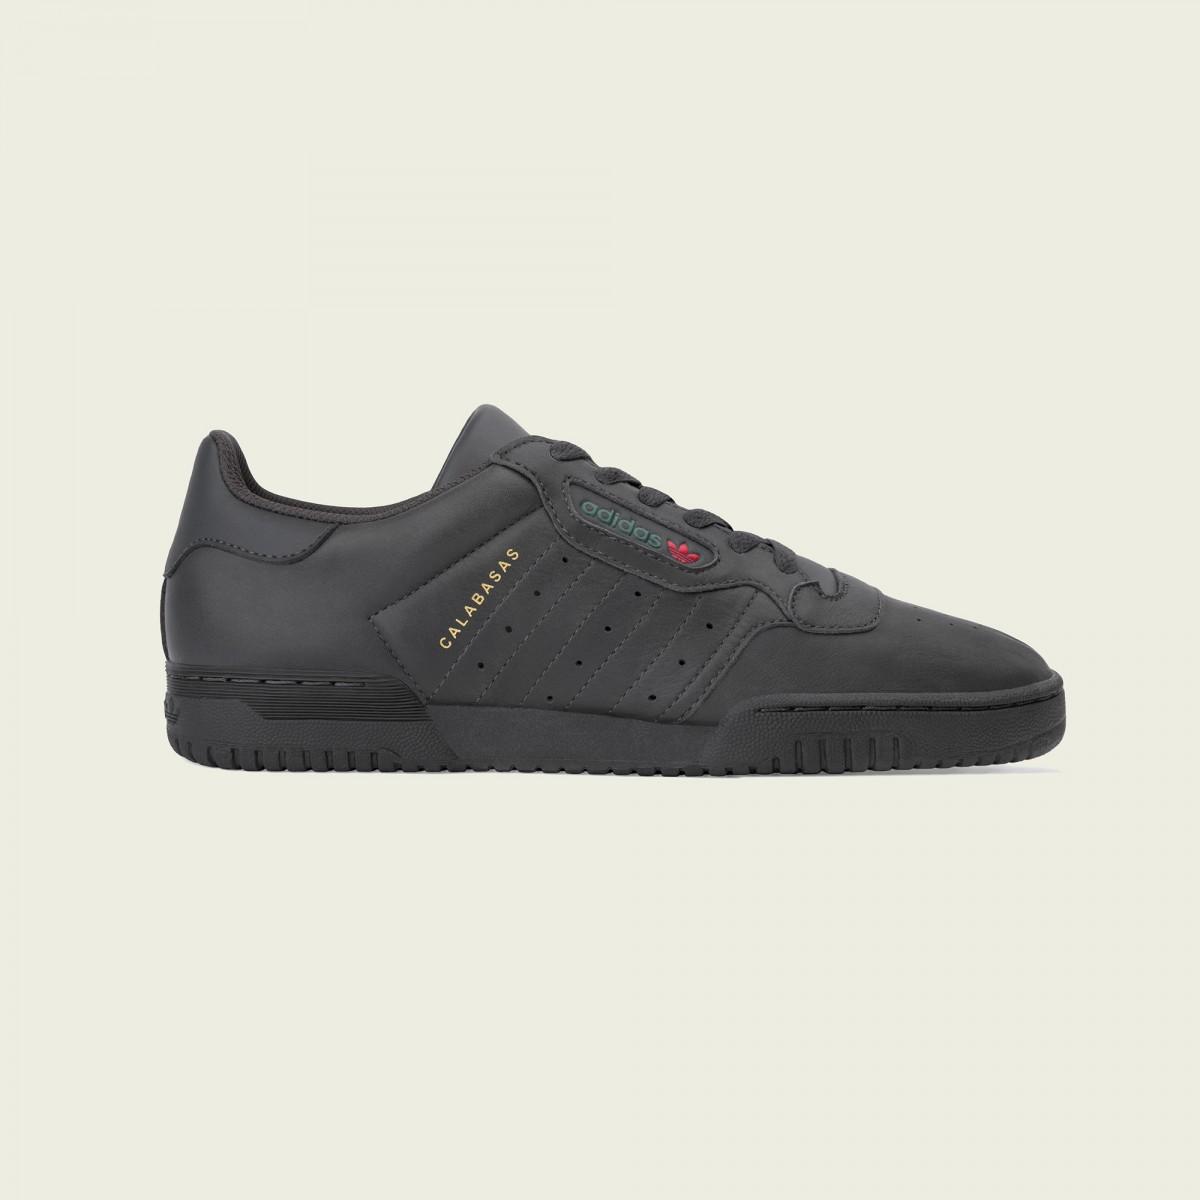 b75c1982b5ad1 greece harga adidas yeezy boost 350 indonesia efd80 47ff2